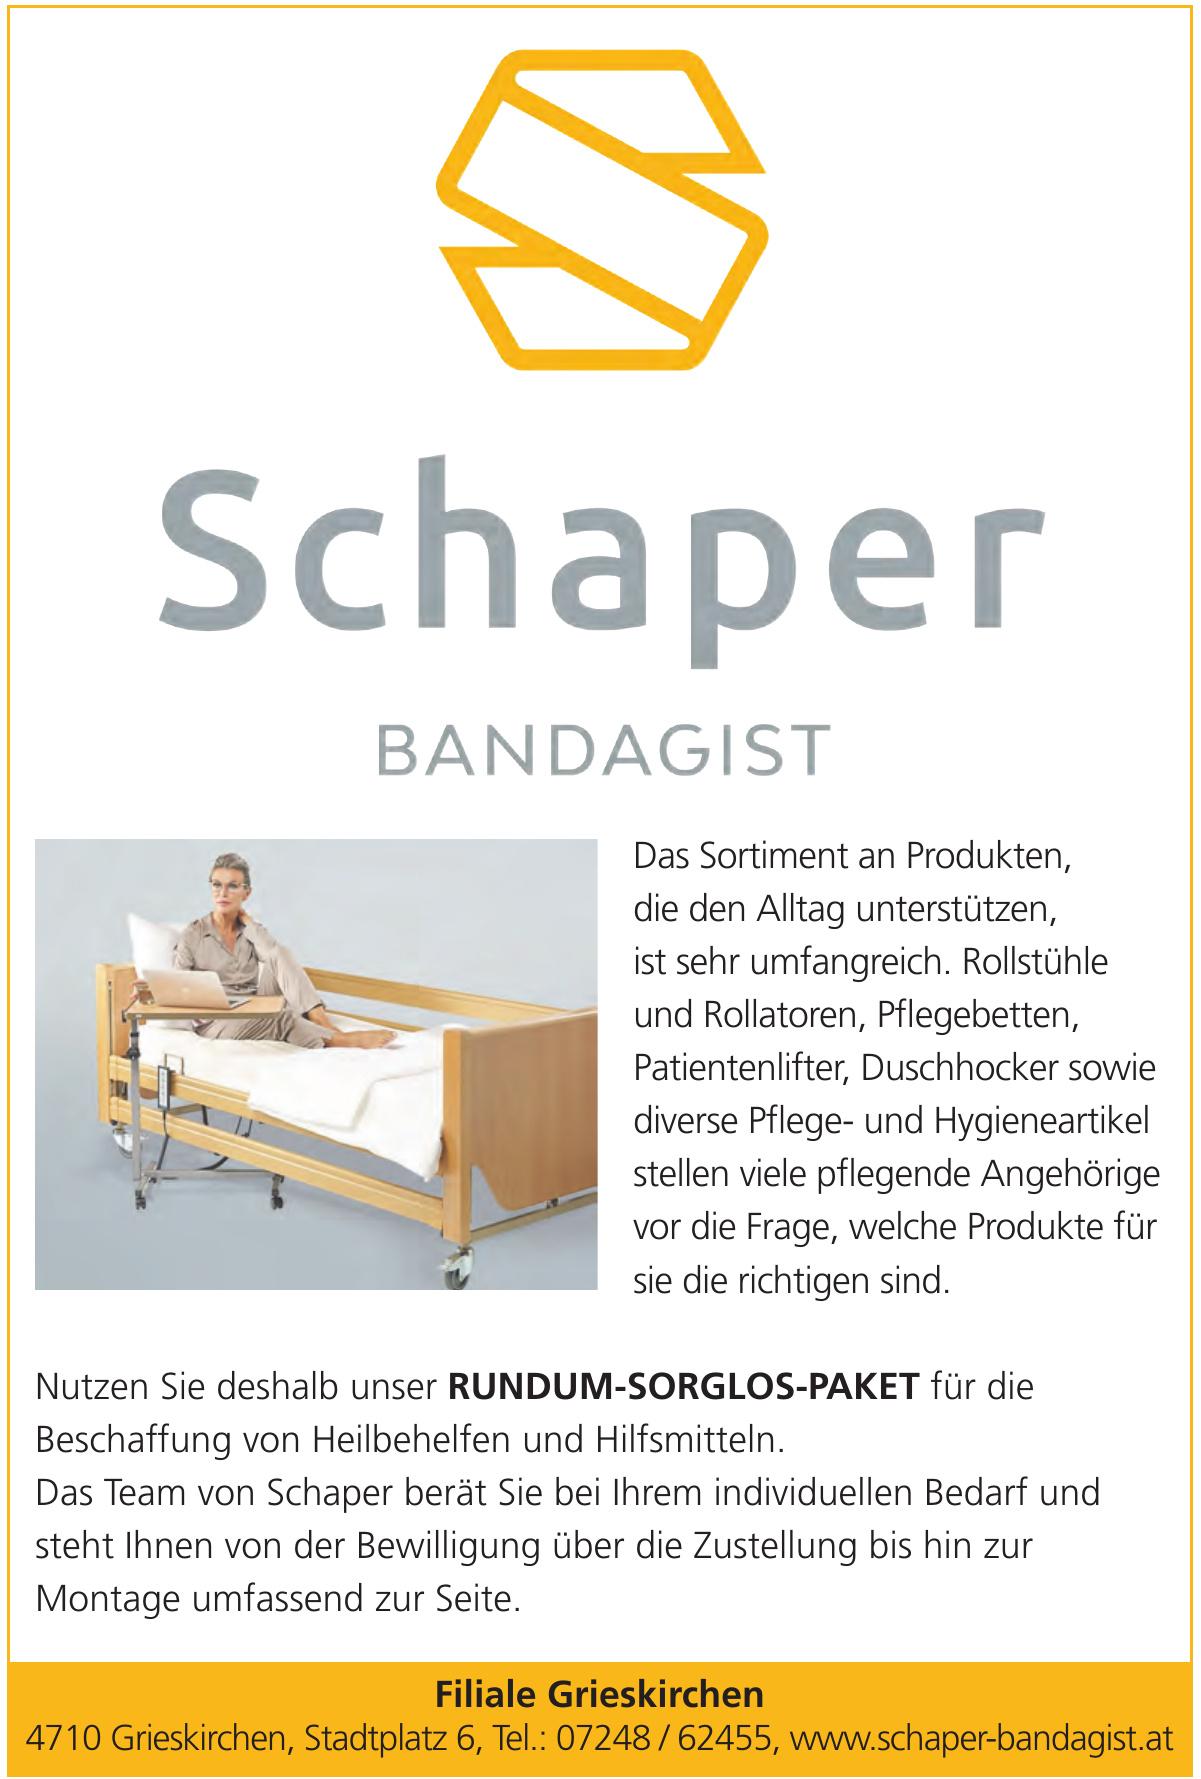 Schaper Bandagist - Filiale Grieskirchen